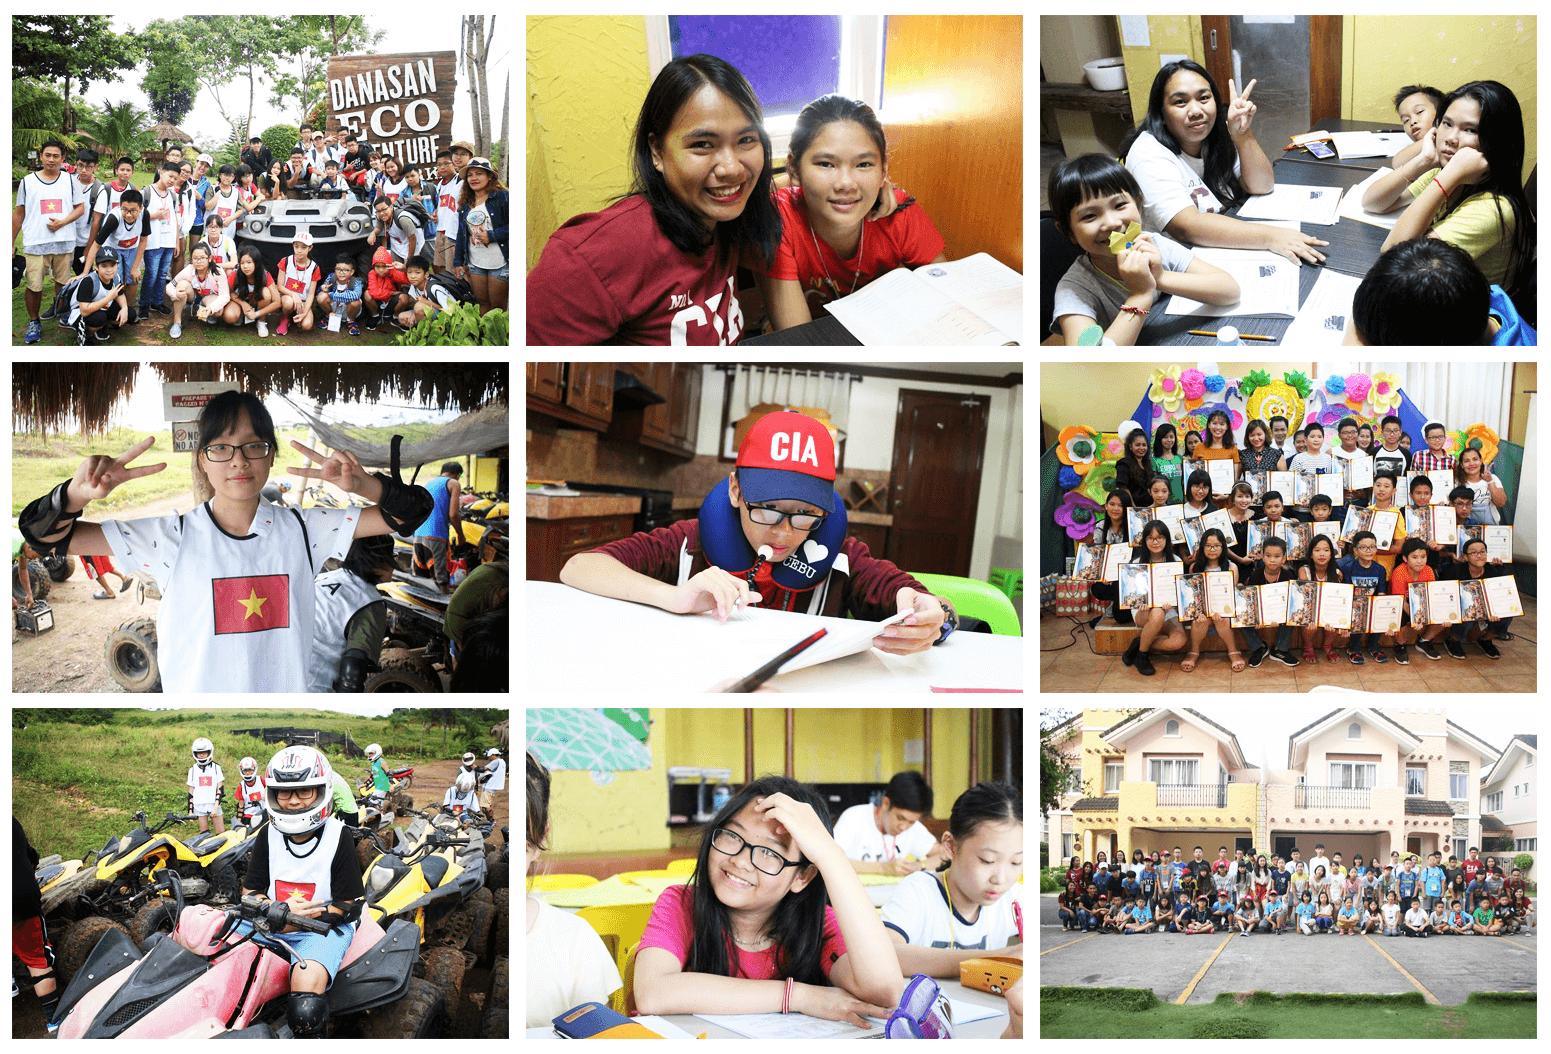 du-hoc-he-philippines-2018-tai-truong-anh-ngu-cia-8